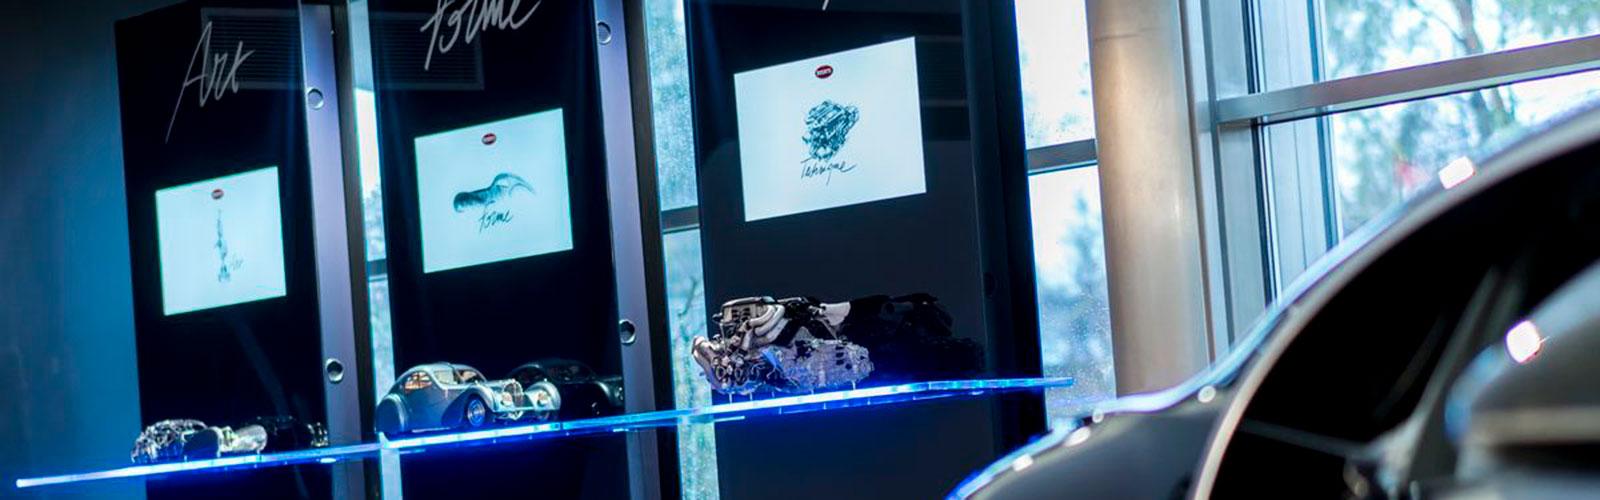 Braunwagner Spatial Interior Design Bugatti Showrooms worldwide